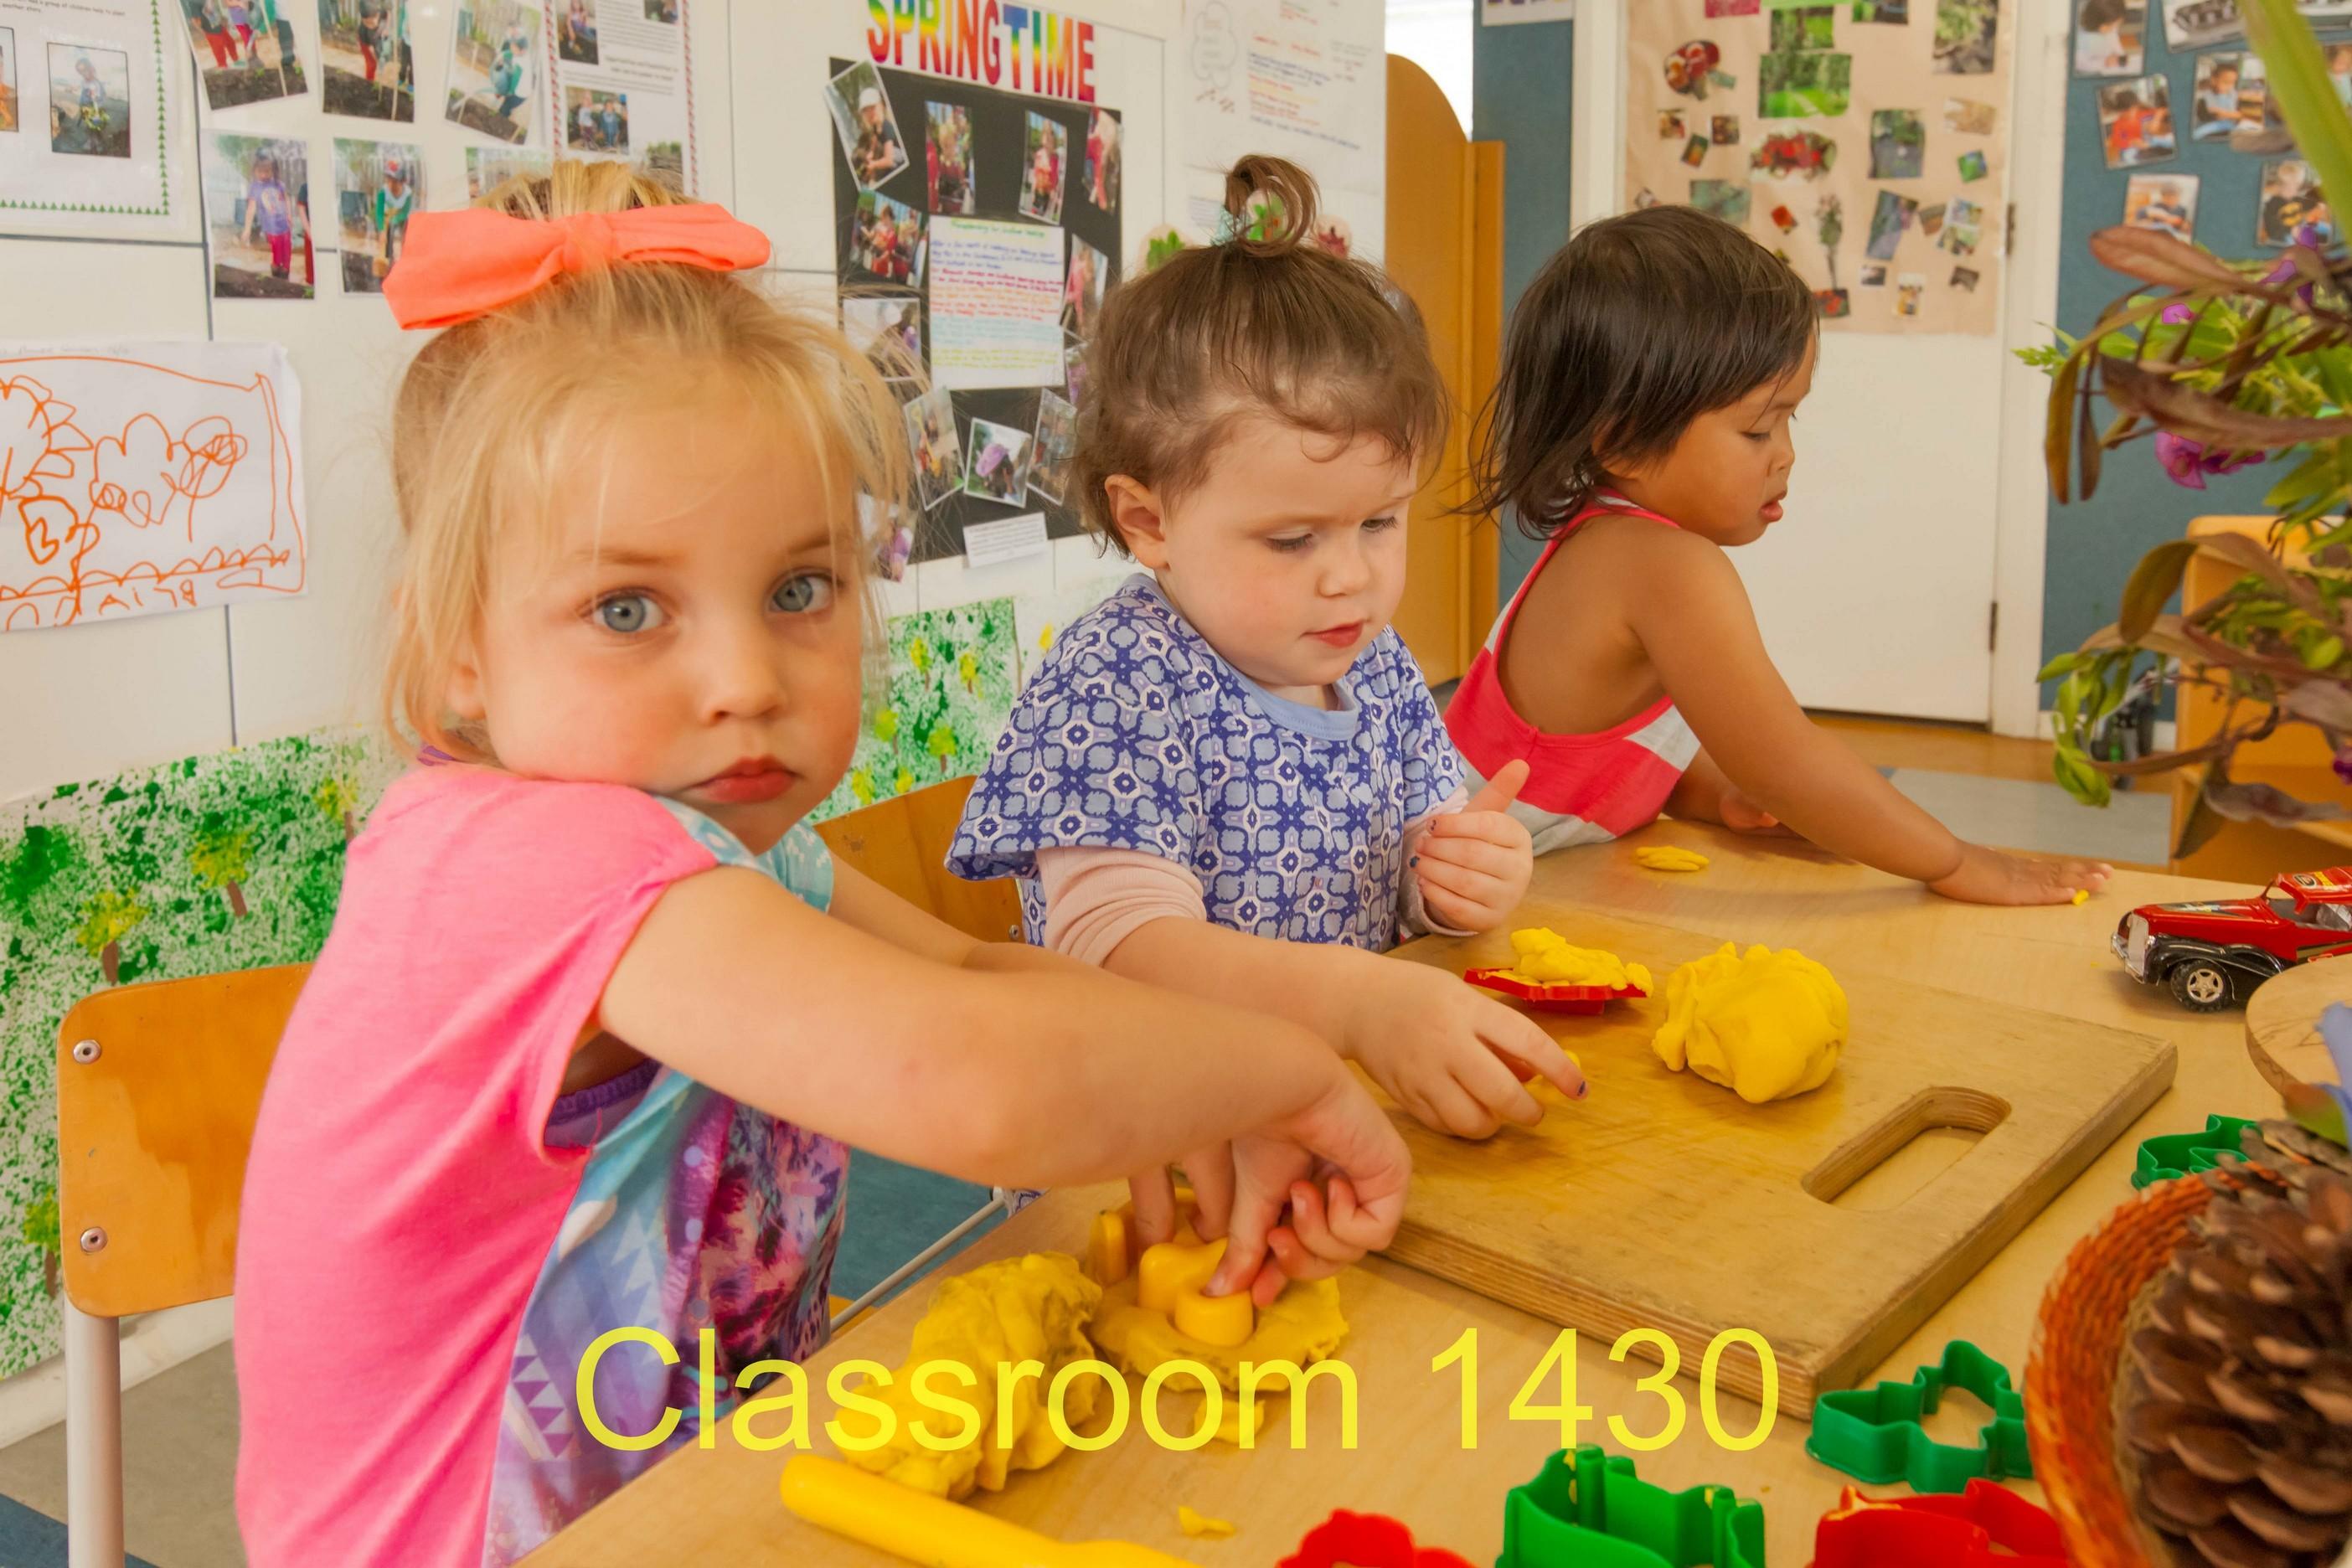 Classroom 1430